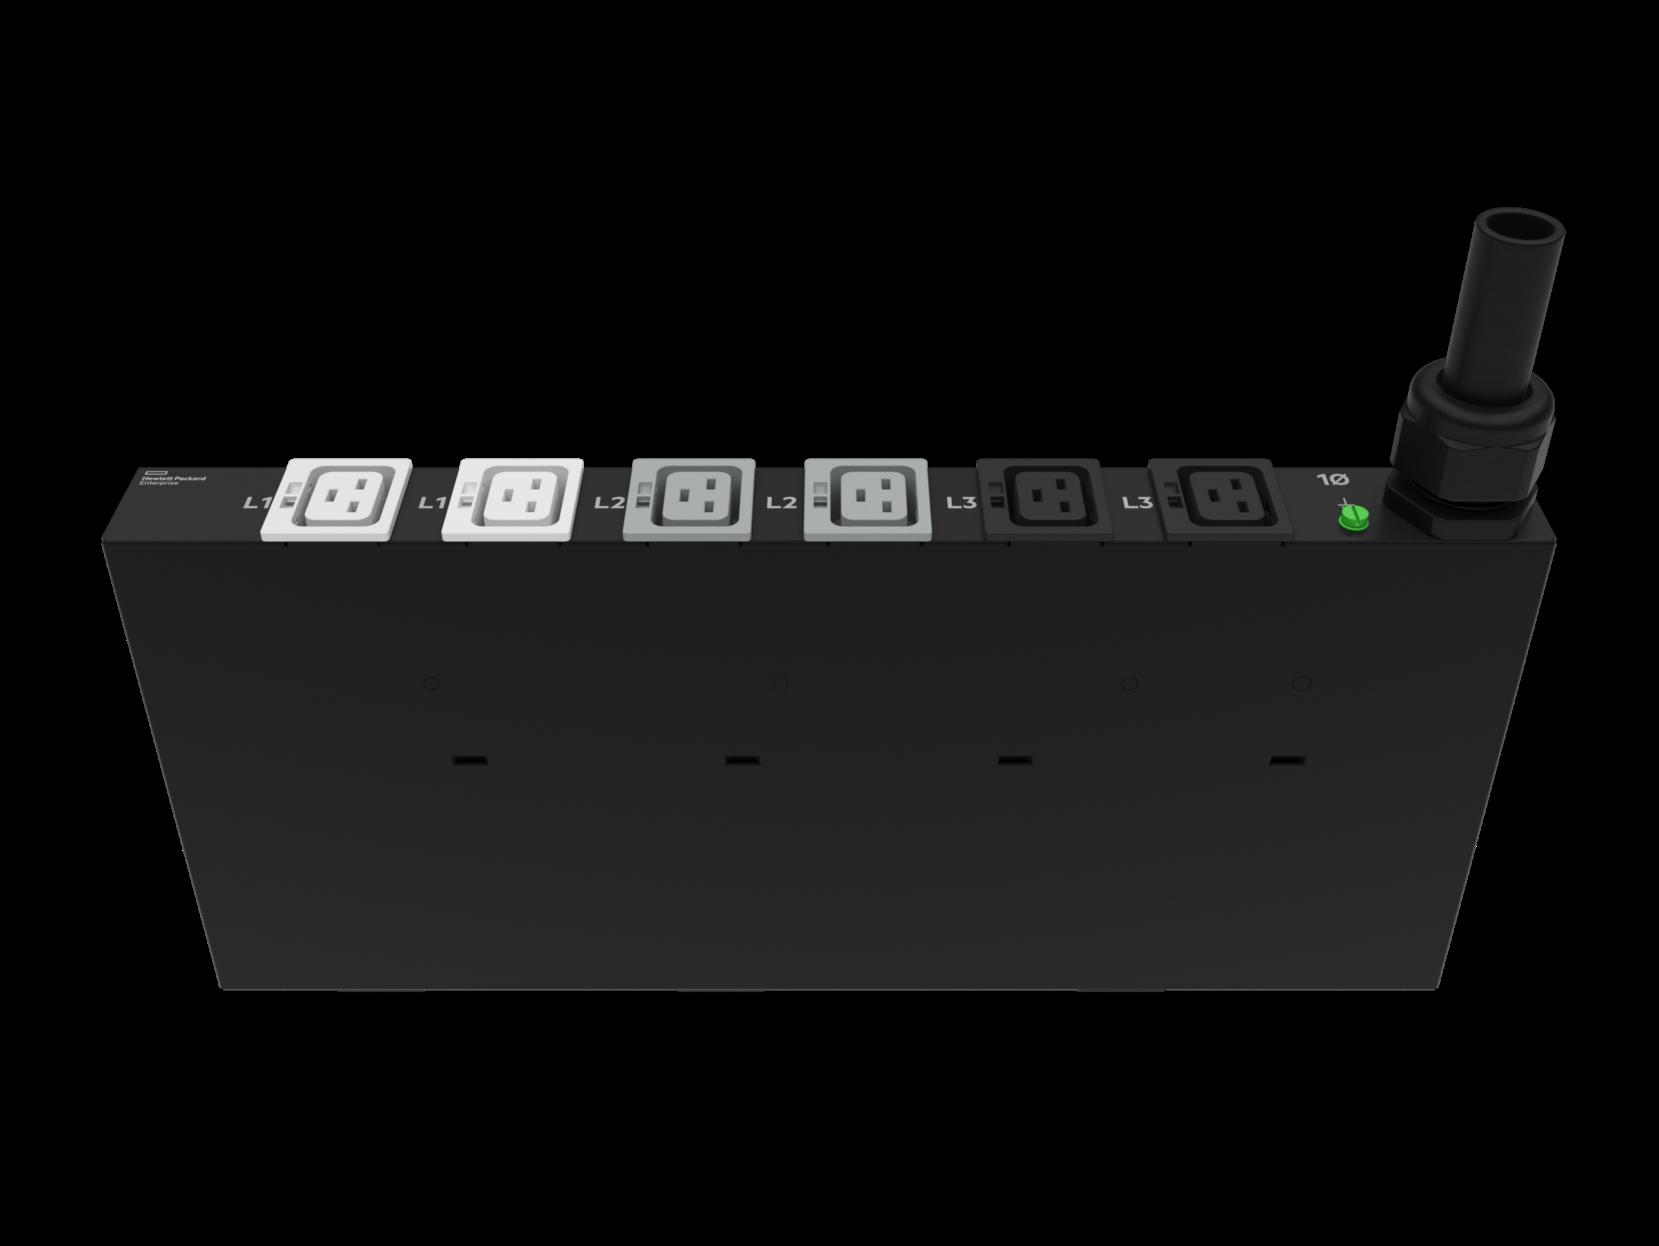 HPE P9Q57A G2 Basic Modular 3Ph 11kVA/60309 5-Wire 16A/230V Outlets (6) C19/1U Horizontal INTL PDU